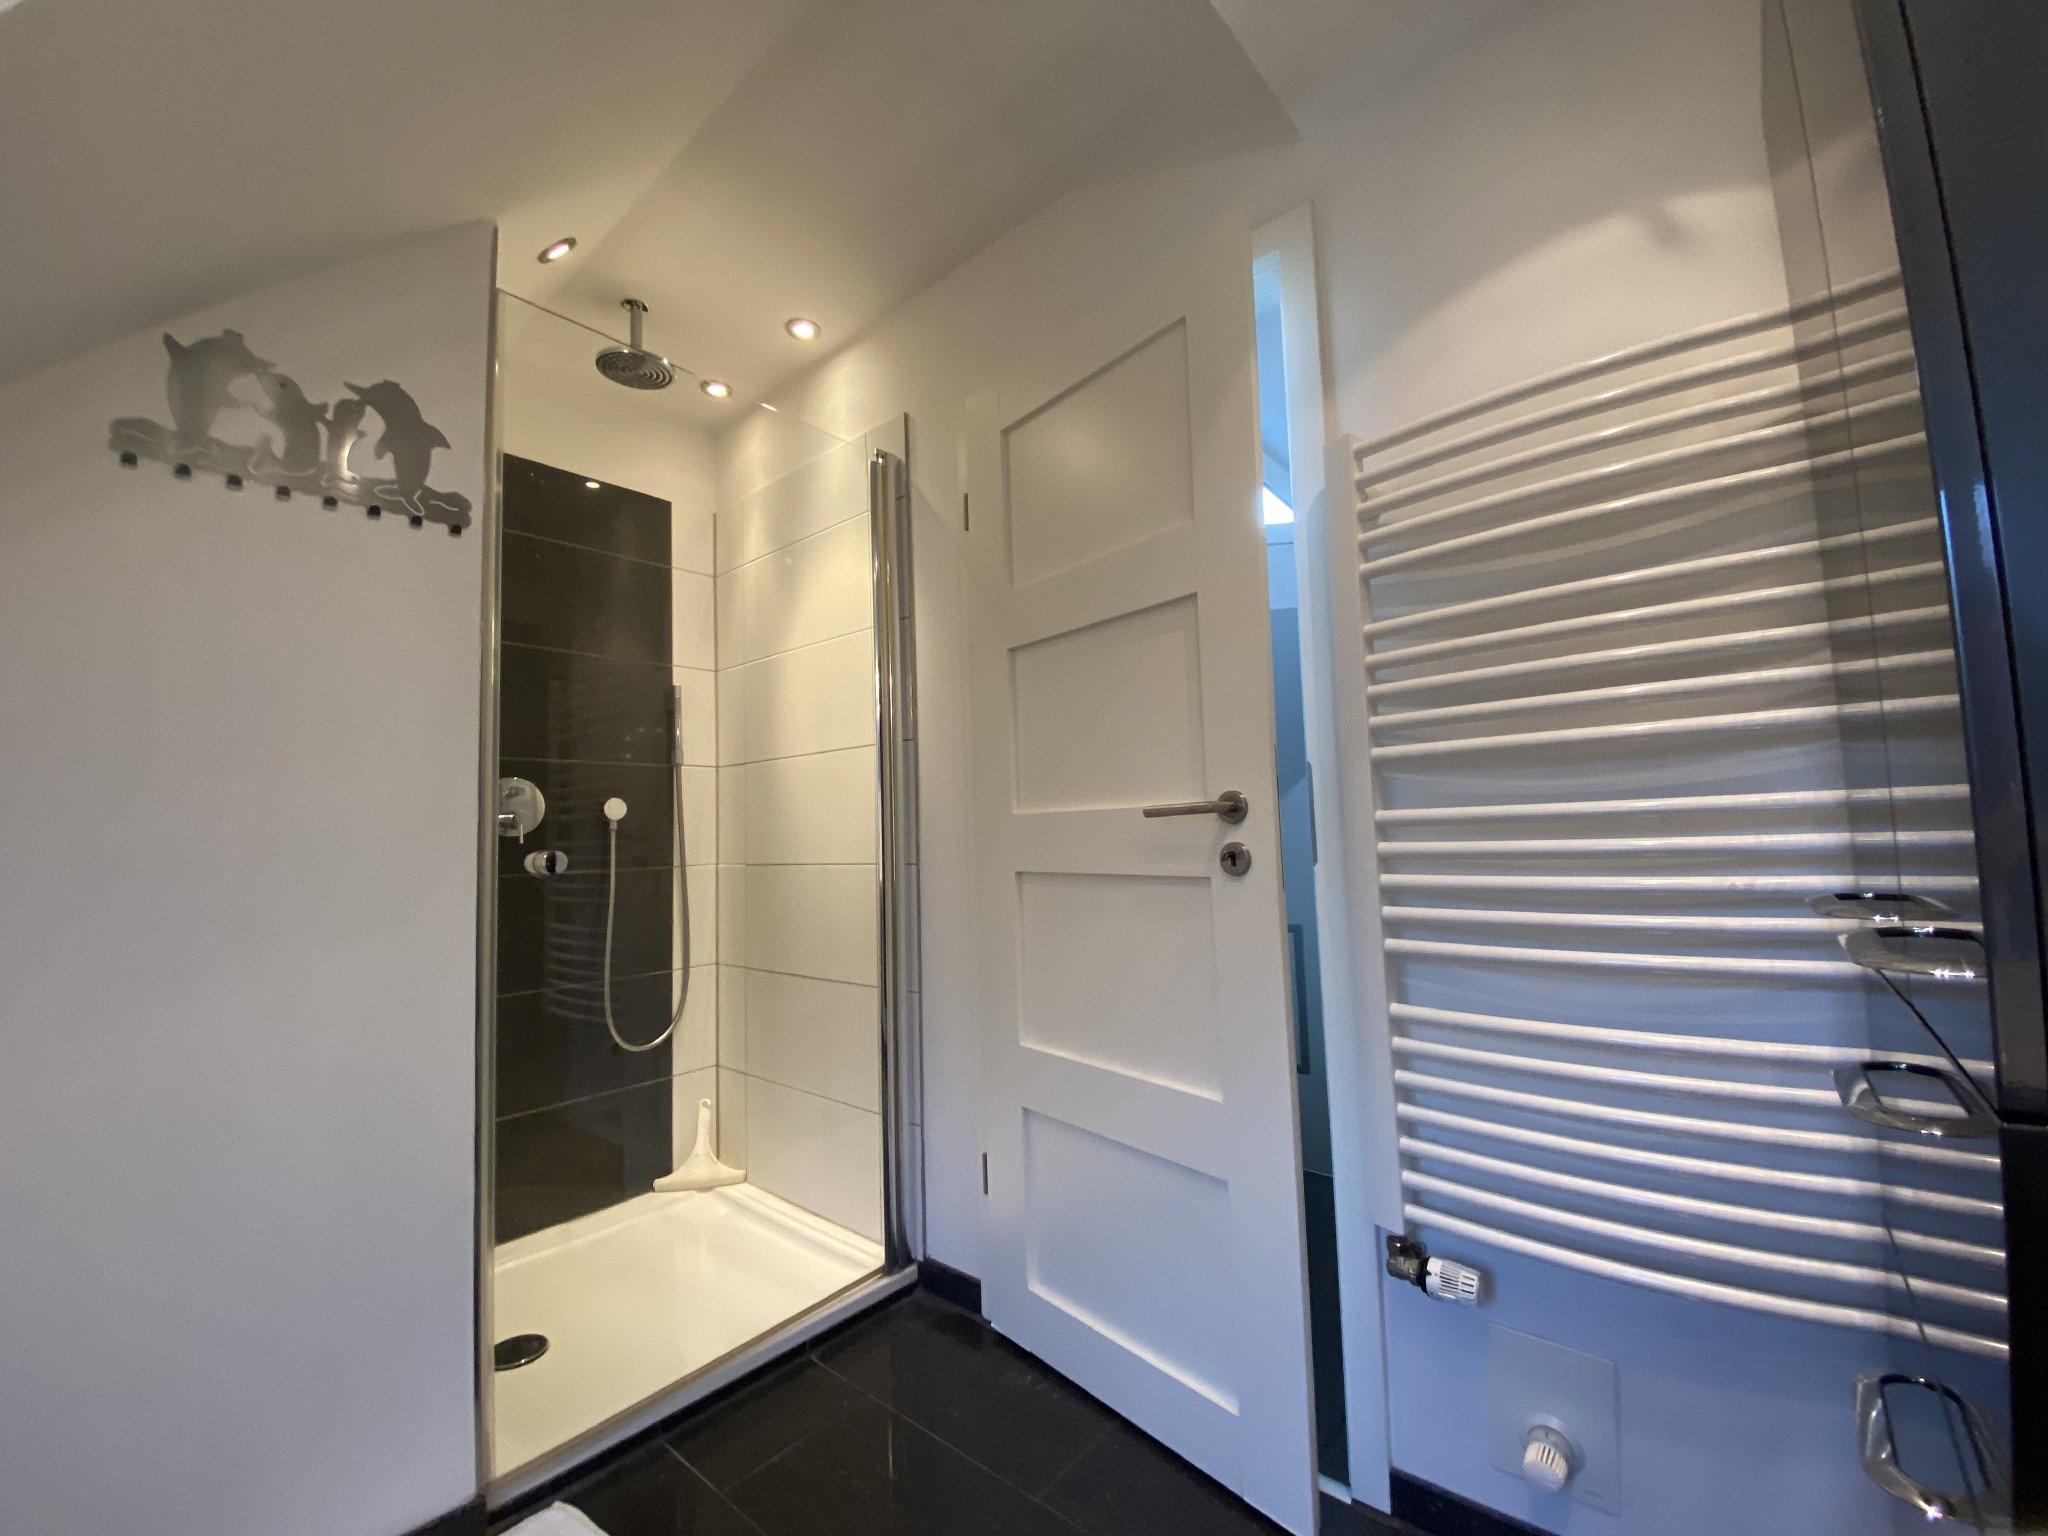 Duschbad Handtuchwärmer Fußbodenheizung